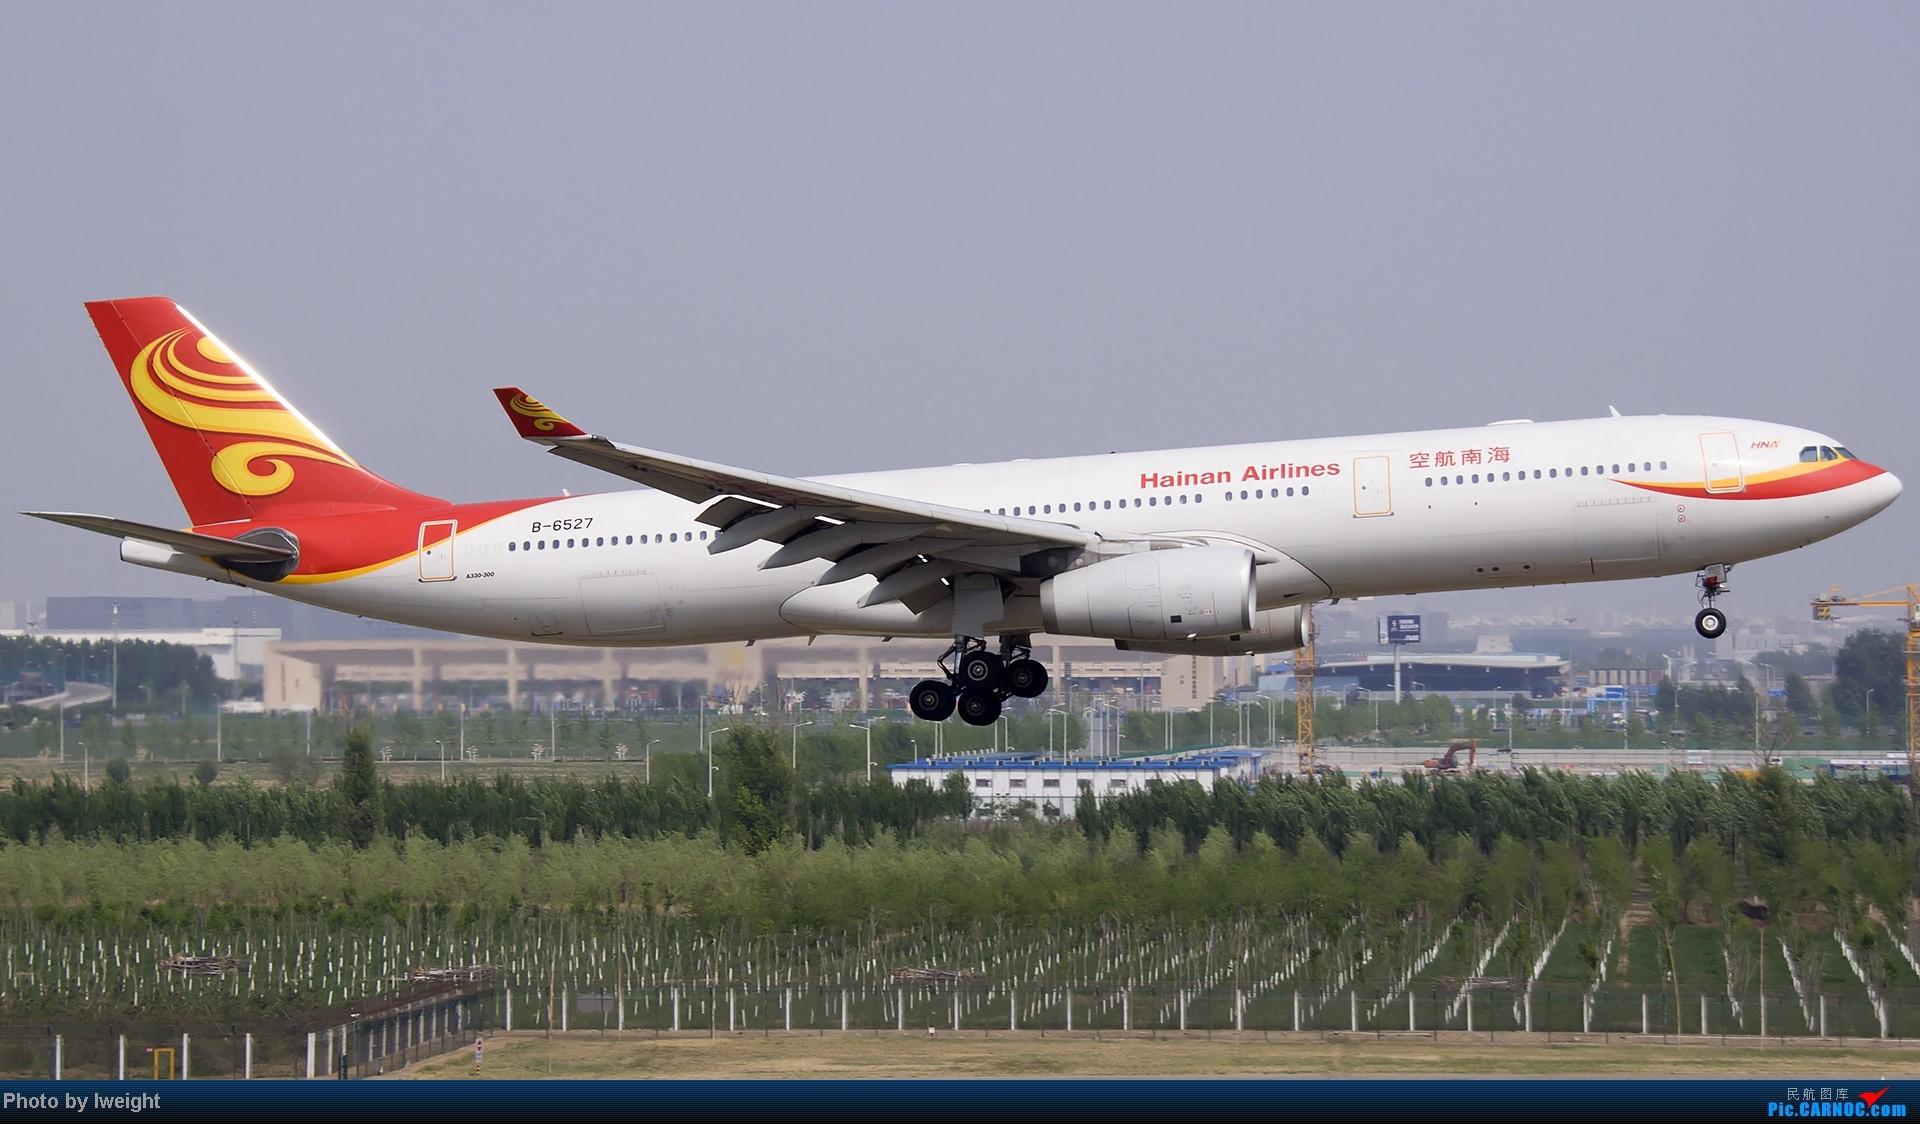 Re:[原创]错过了卡航的巴塞罗那号,只有这些大路货了,泪奔啊 AIRBUS A330-300 B-6527 中国北京首都机场